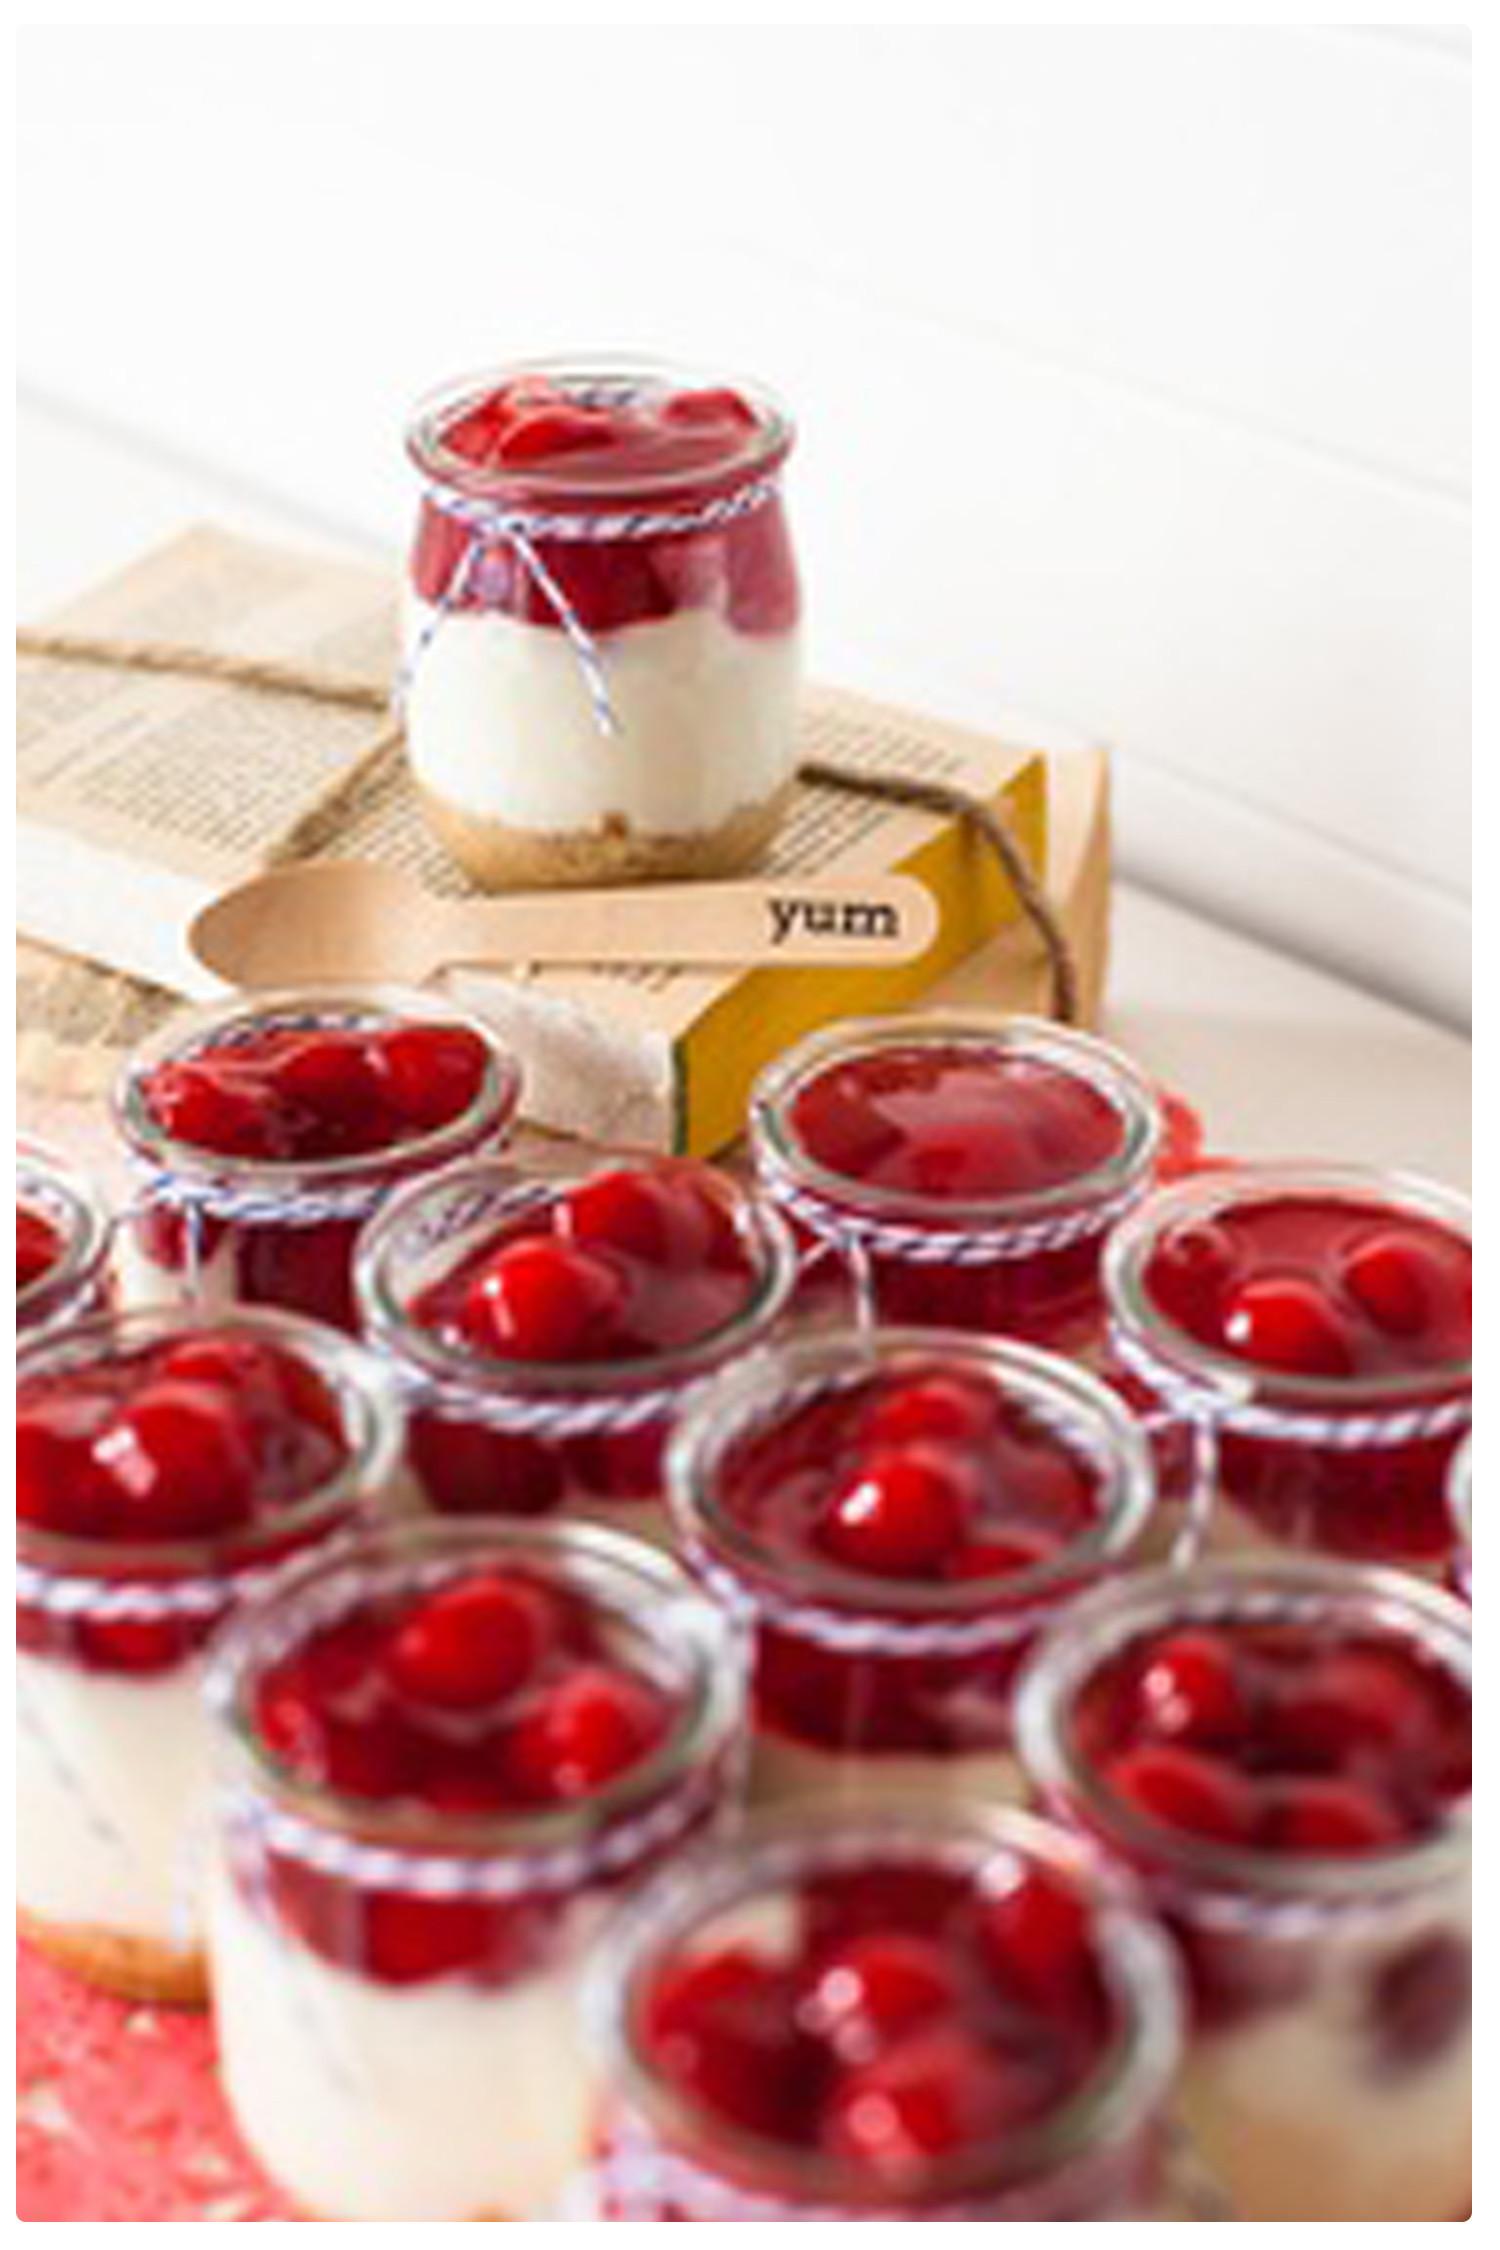 Desserts In Mason Jar  Some Inspirational Style Ideas Using Mason Jars